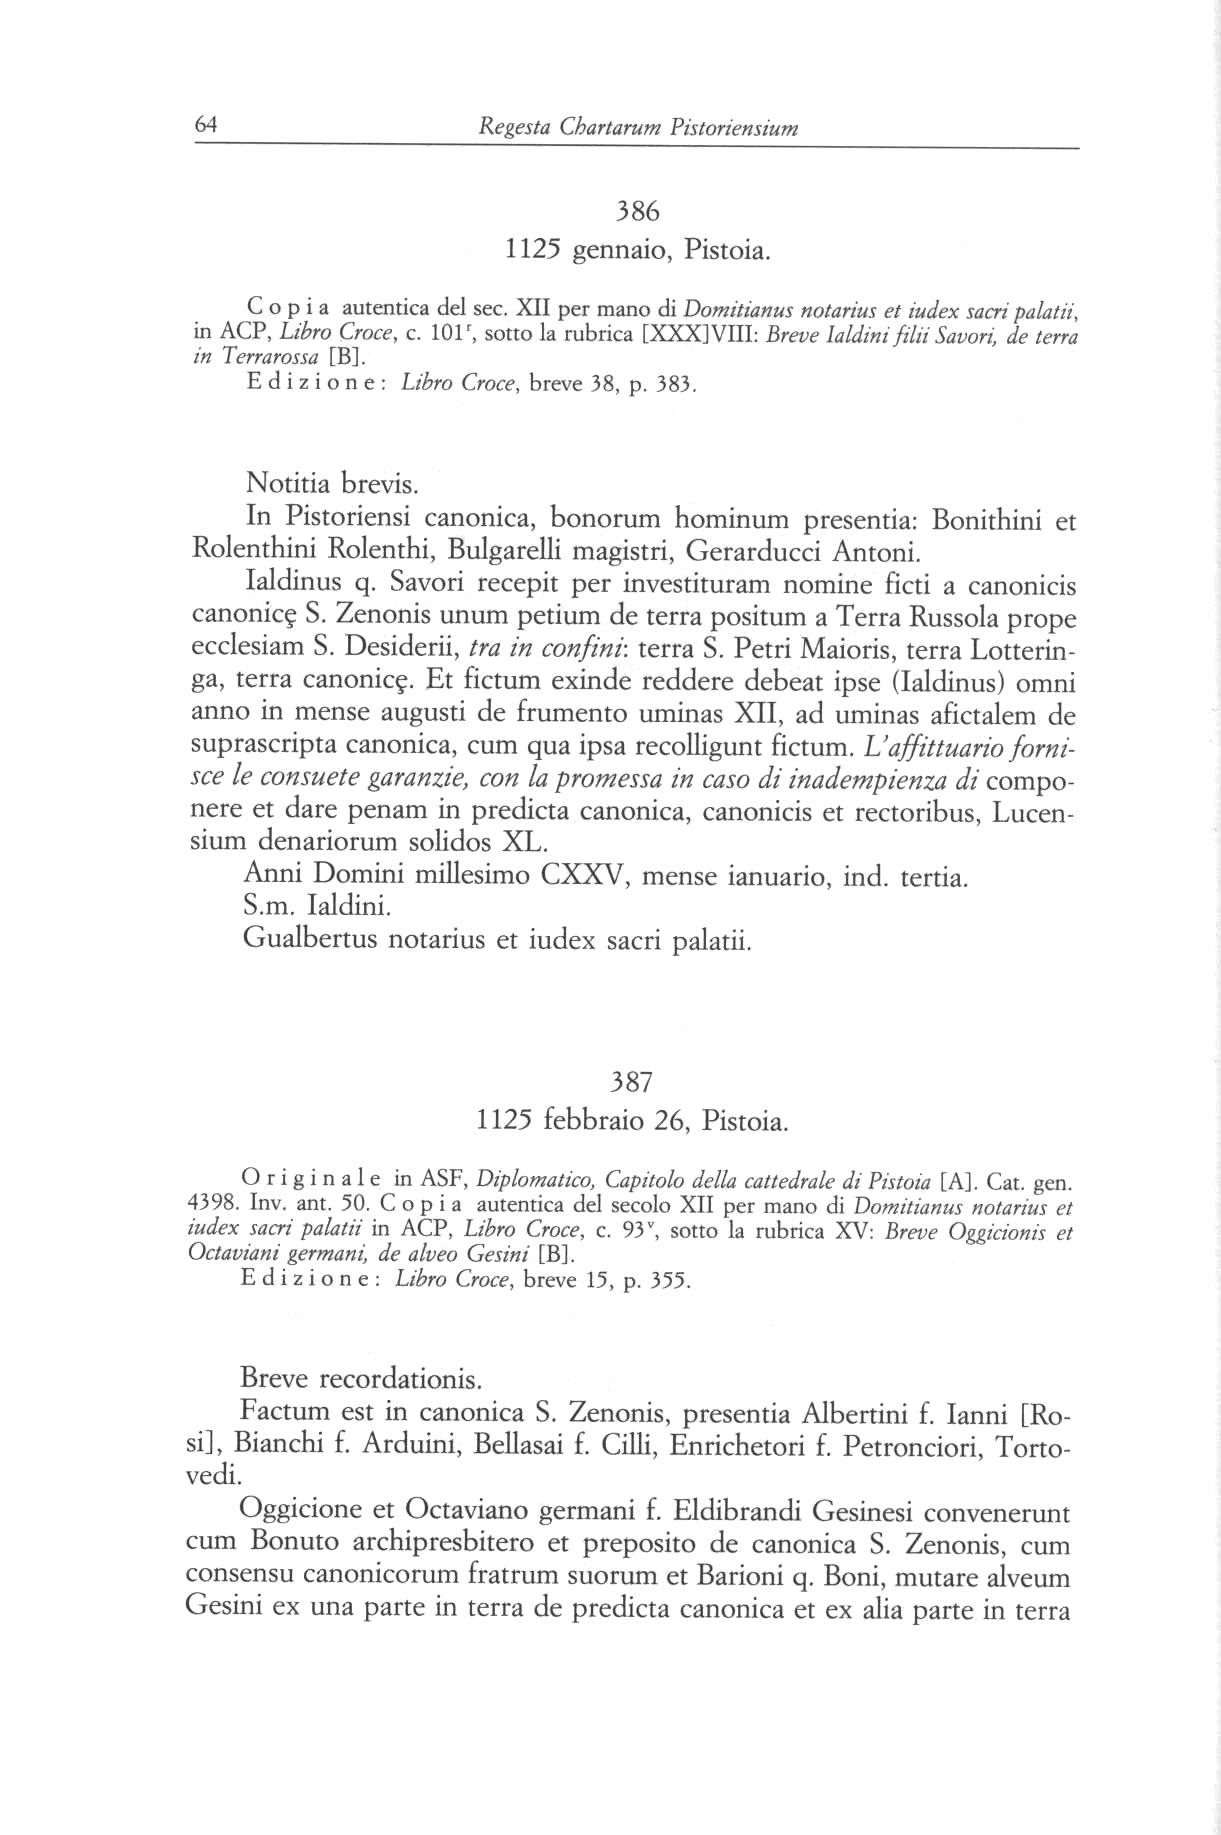 Canonica S. Zenone XII 0064.jpg